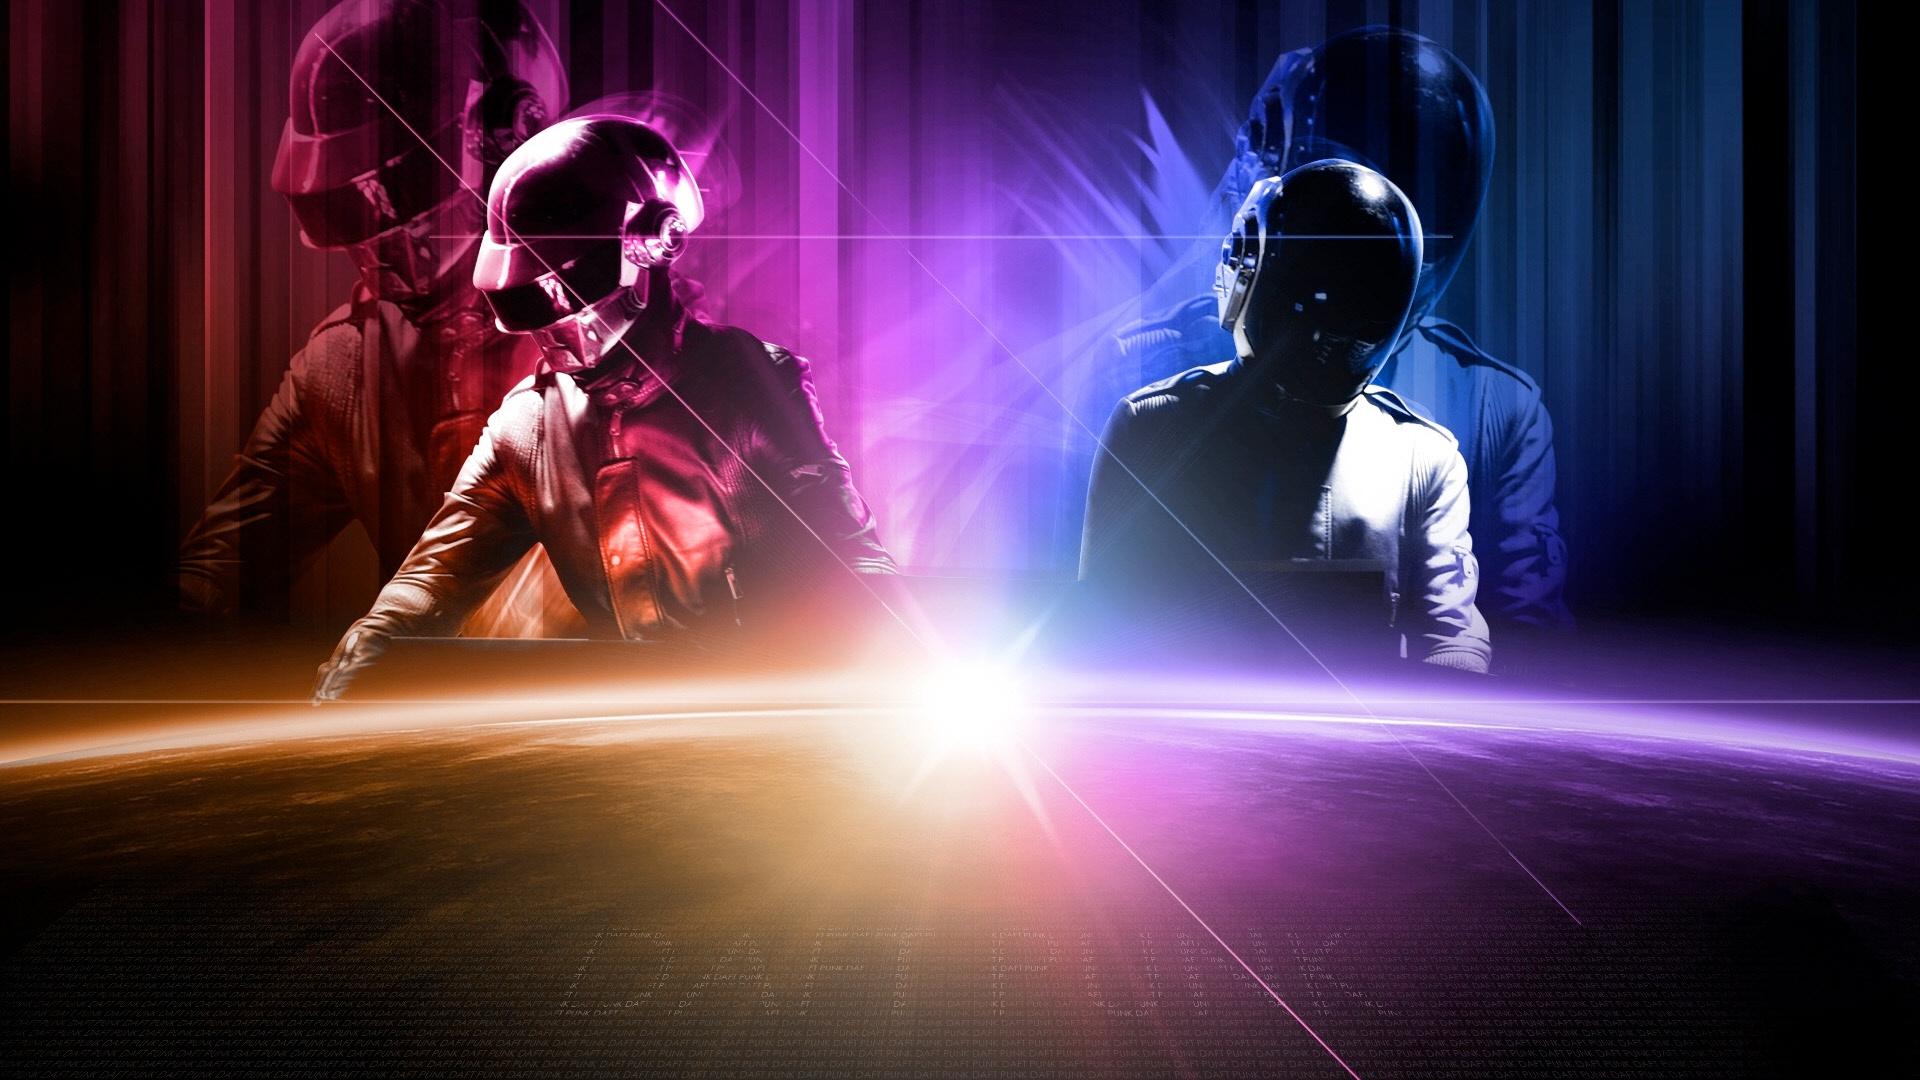 Daft Punk Backdrop Wallpaper